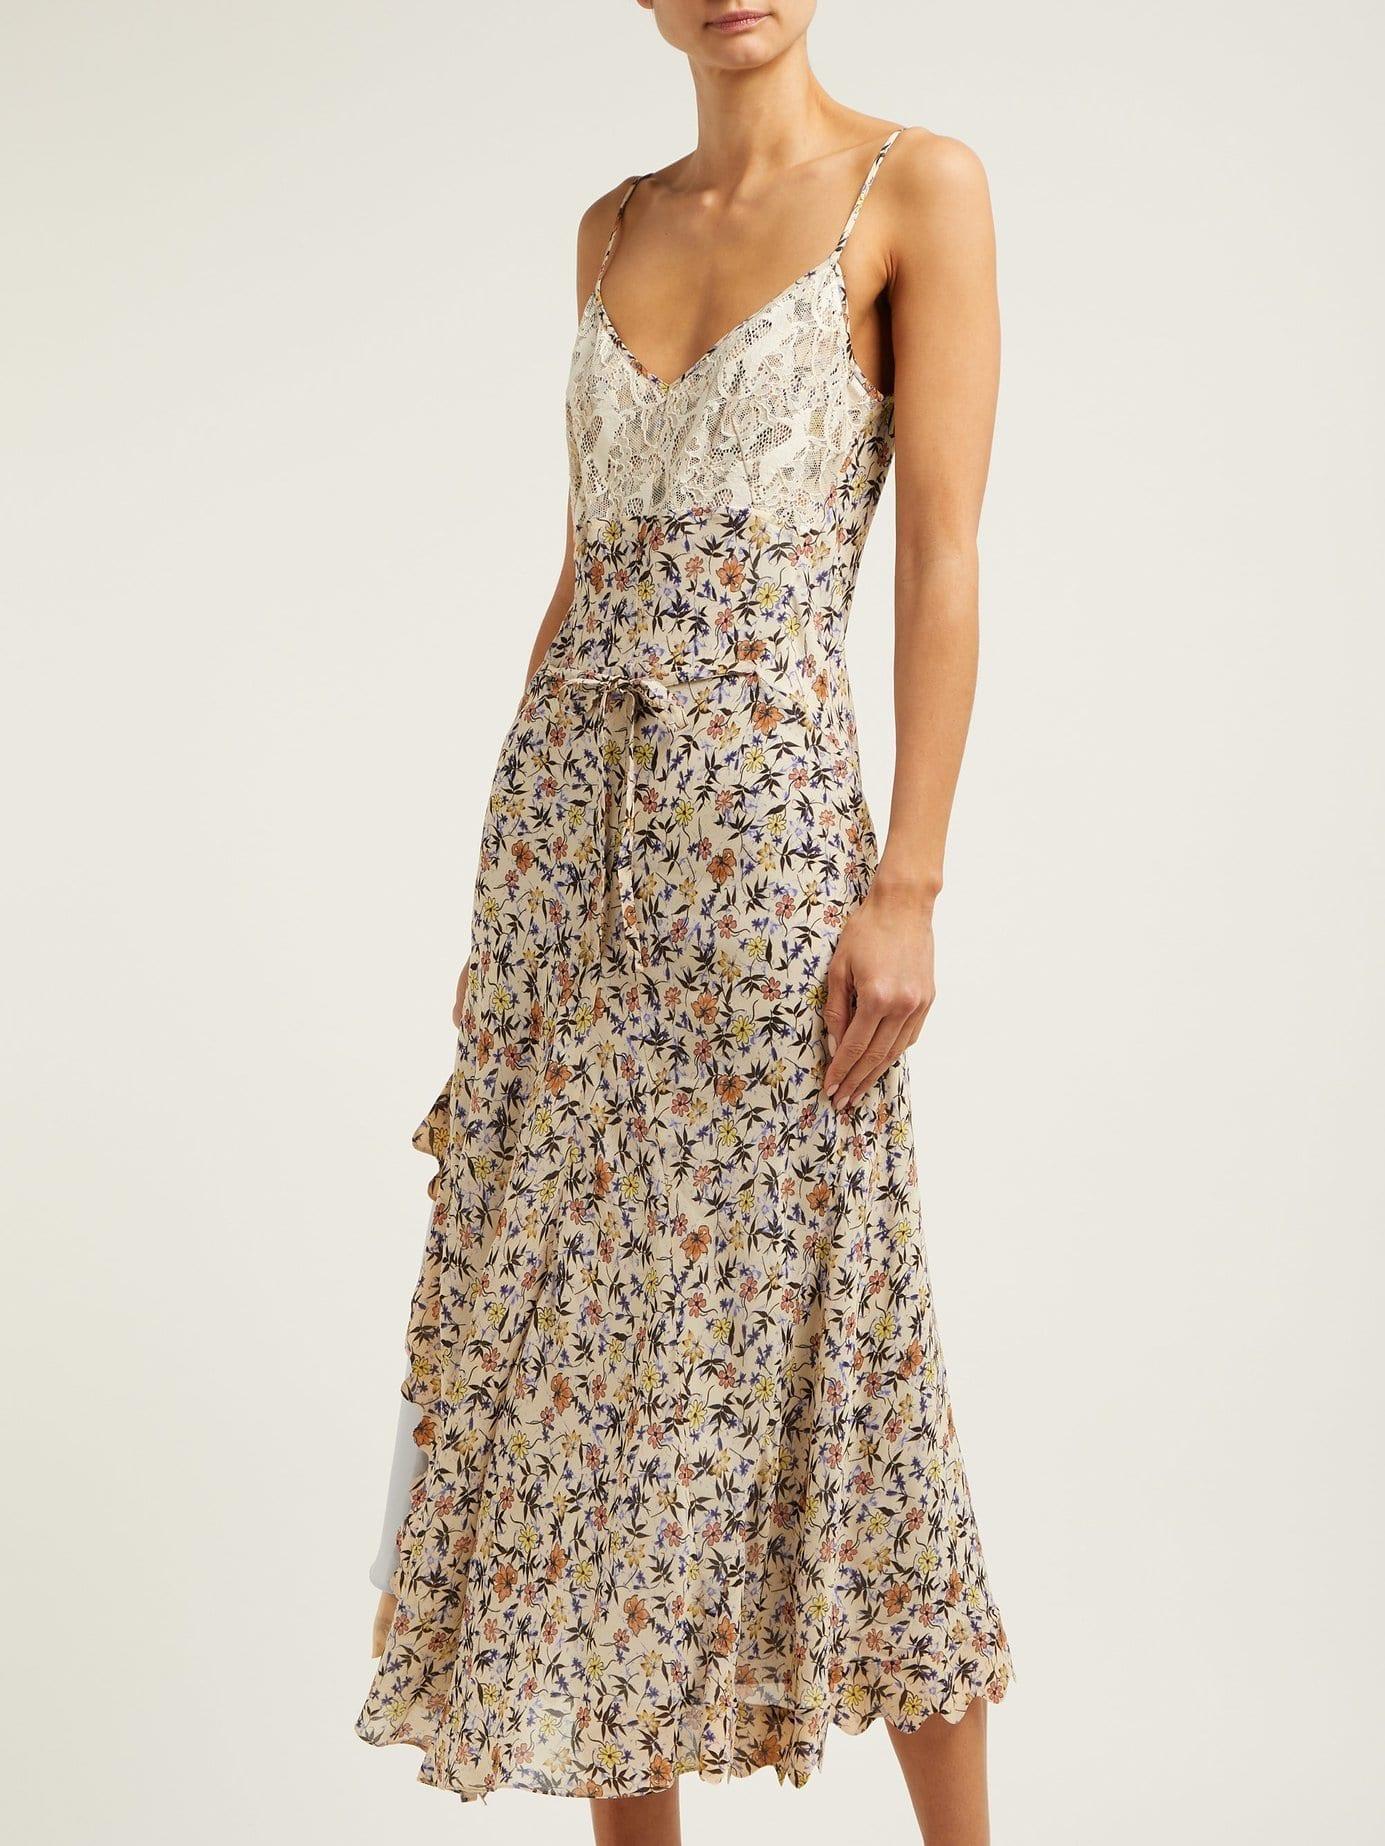 CHLOÉ Lace Insert Georgette Midi Cream / Floral Printed Dress